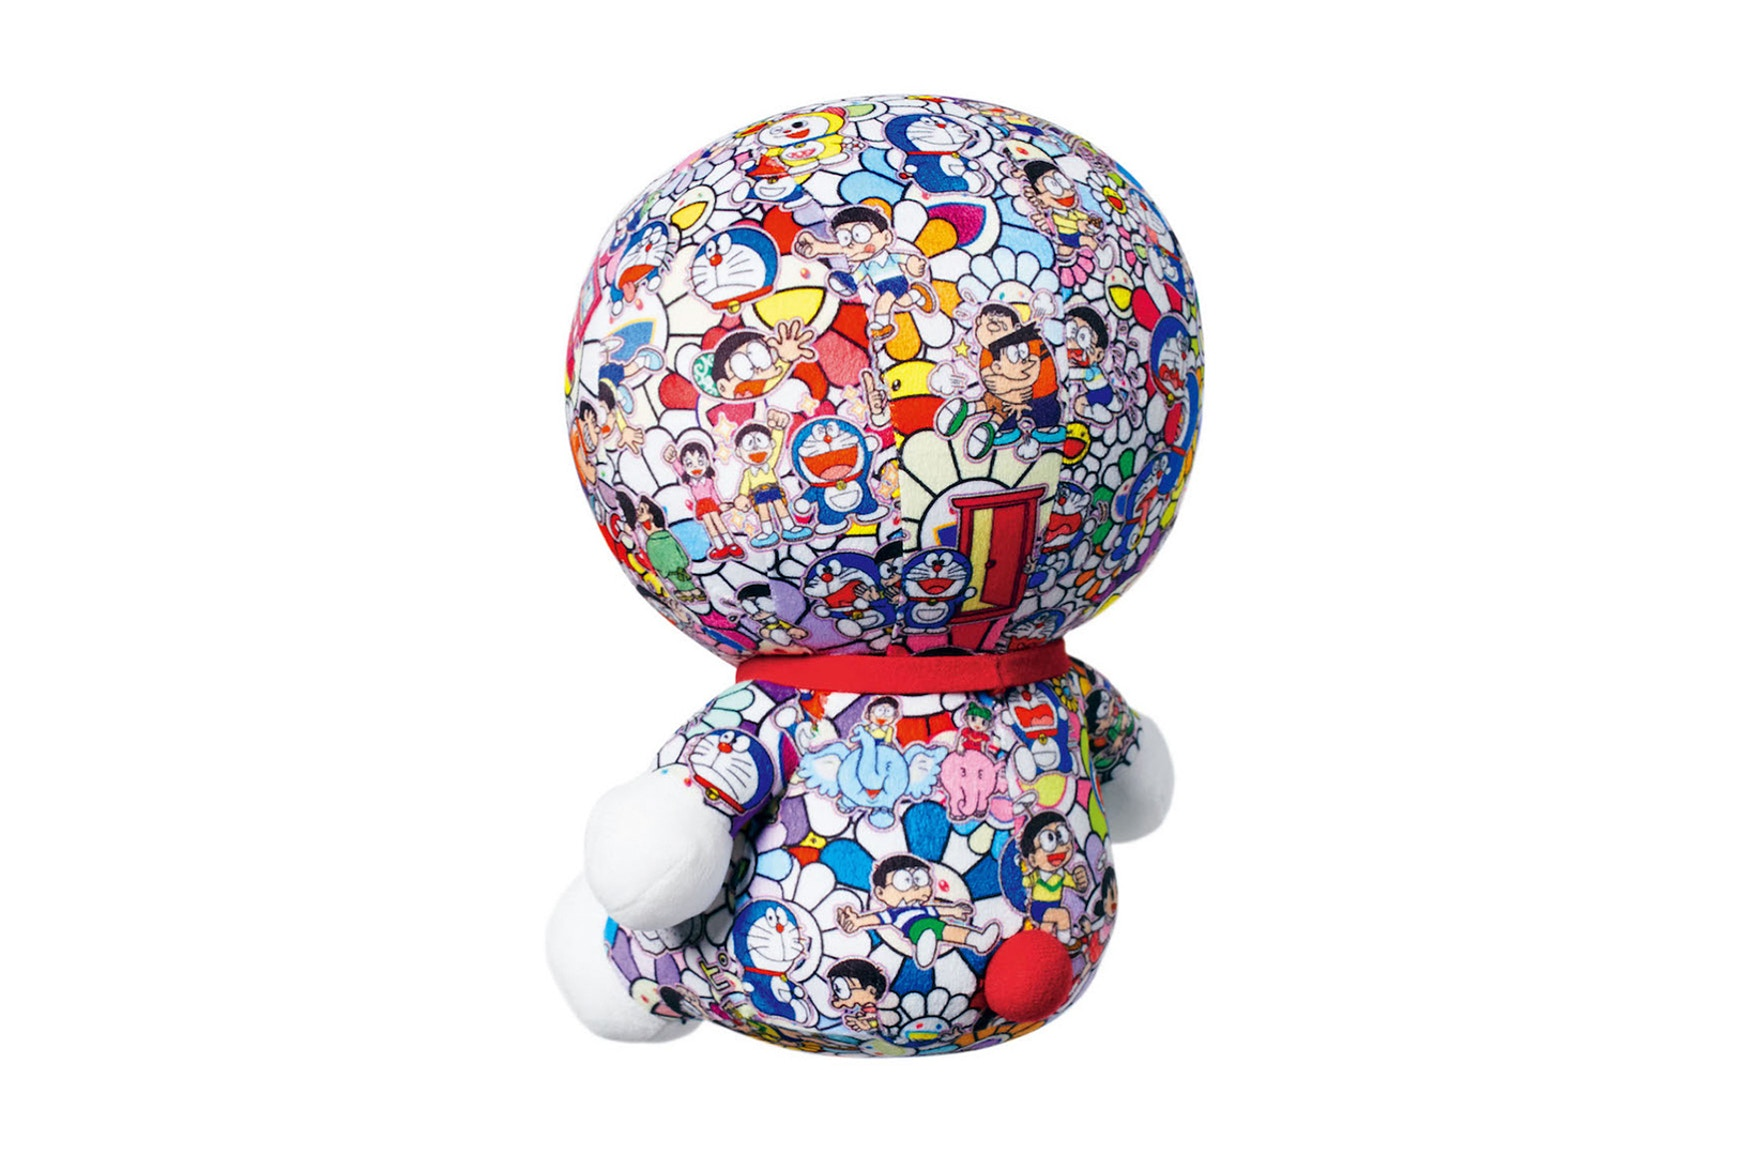 takashi-murakami-doraemon-uniqlo-ut-collection-2